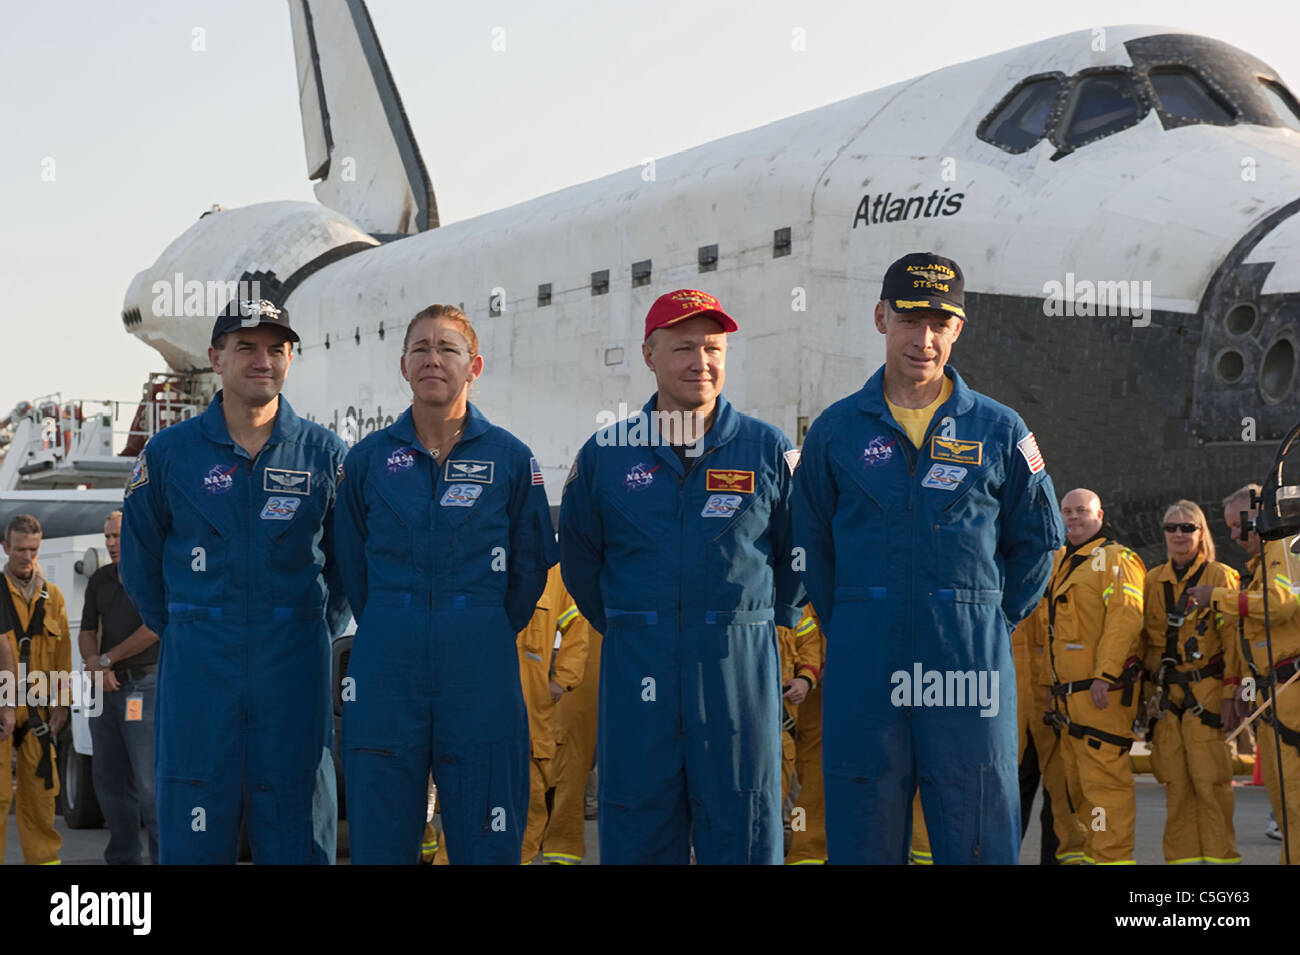 Atlantis Space Shuttle Stock Photos & Atlantis Space ...